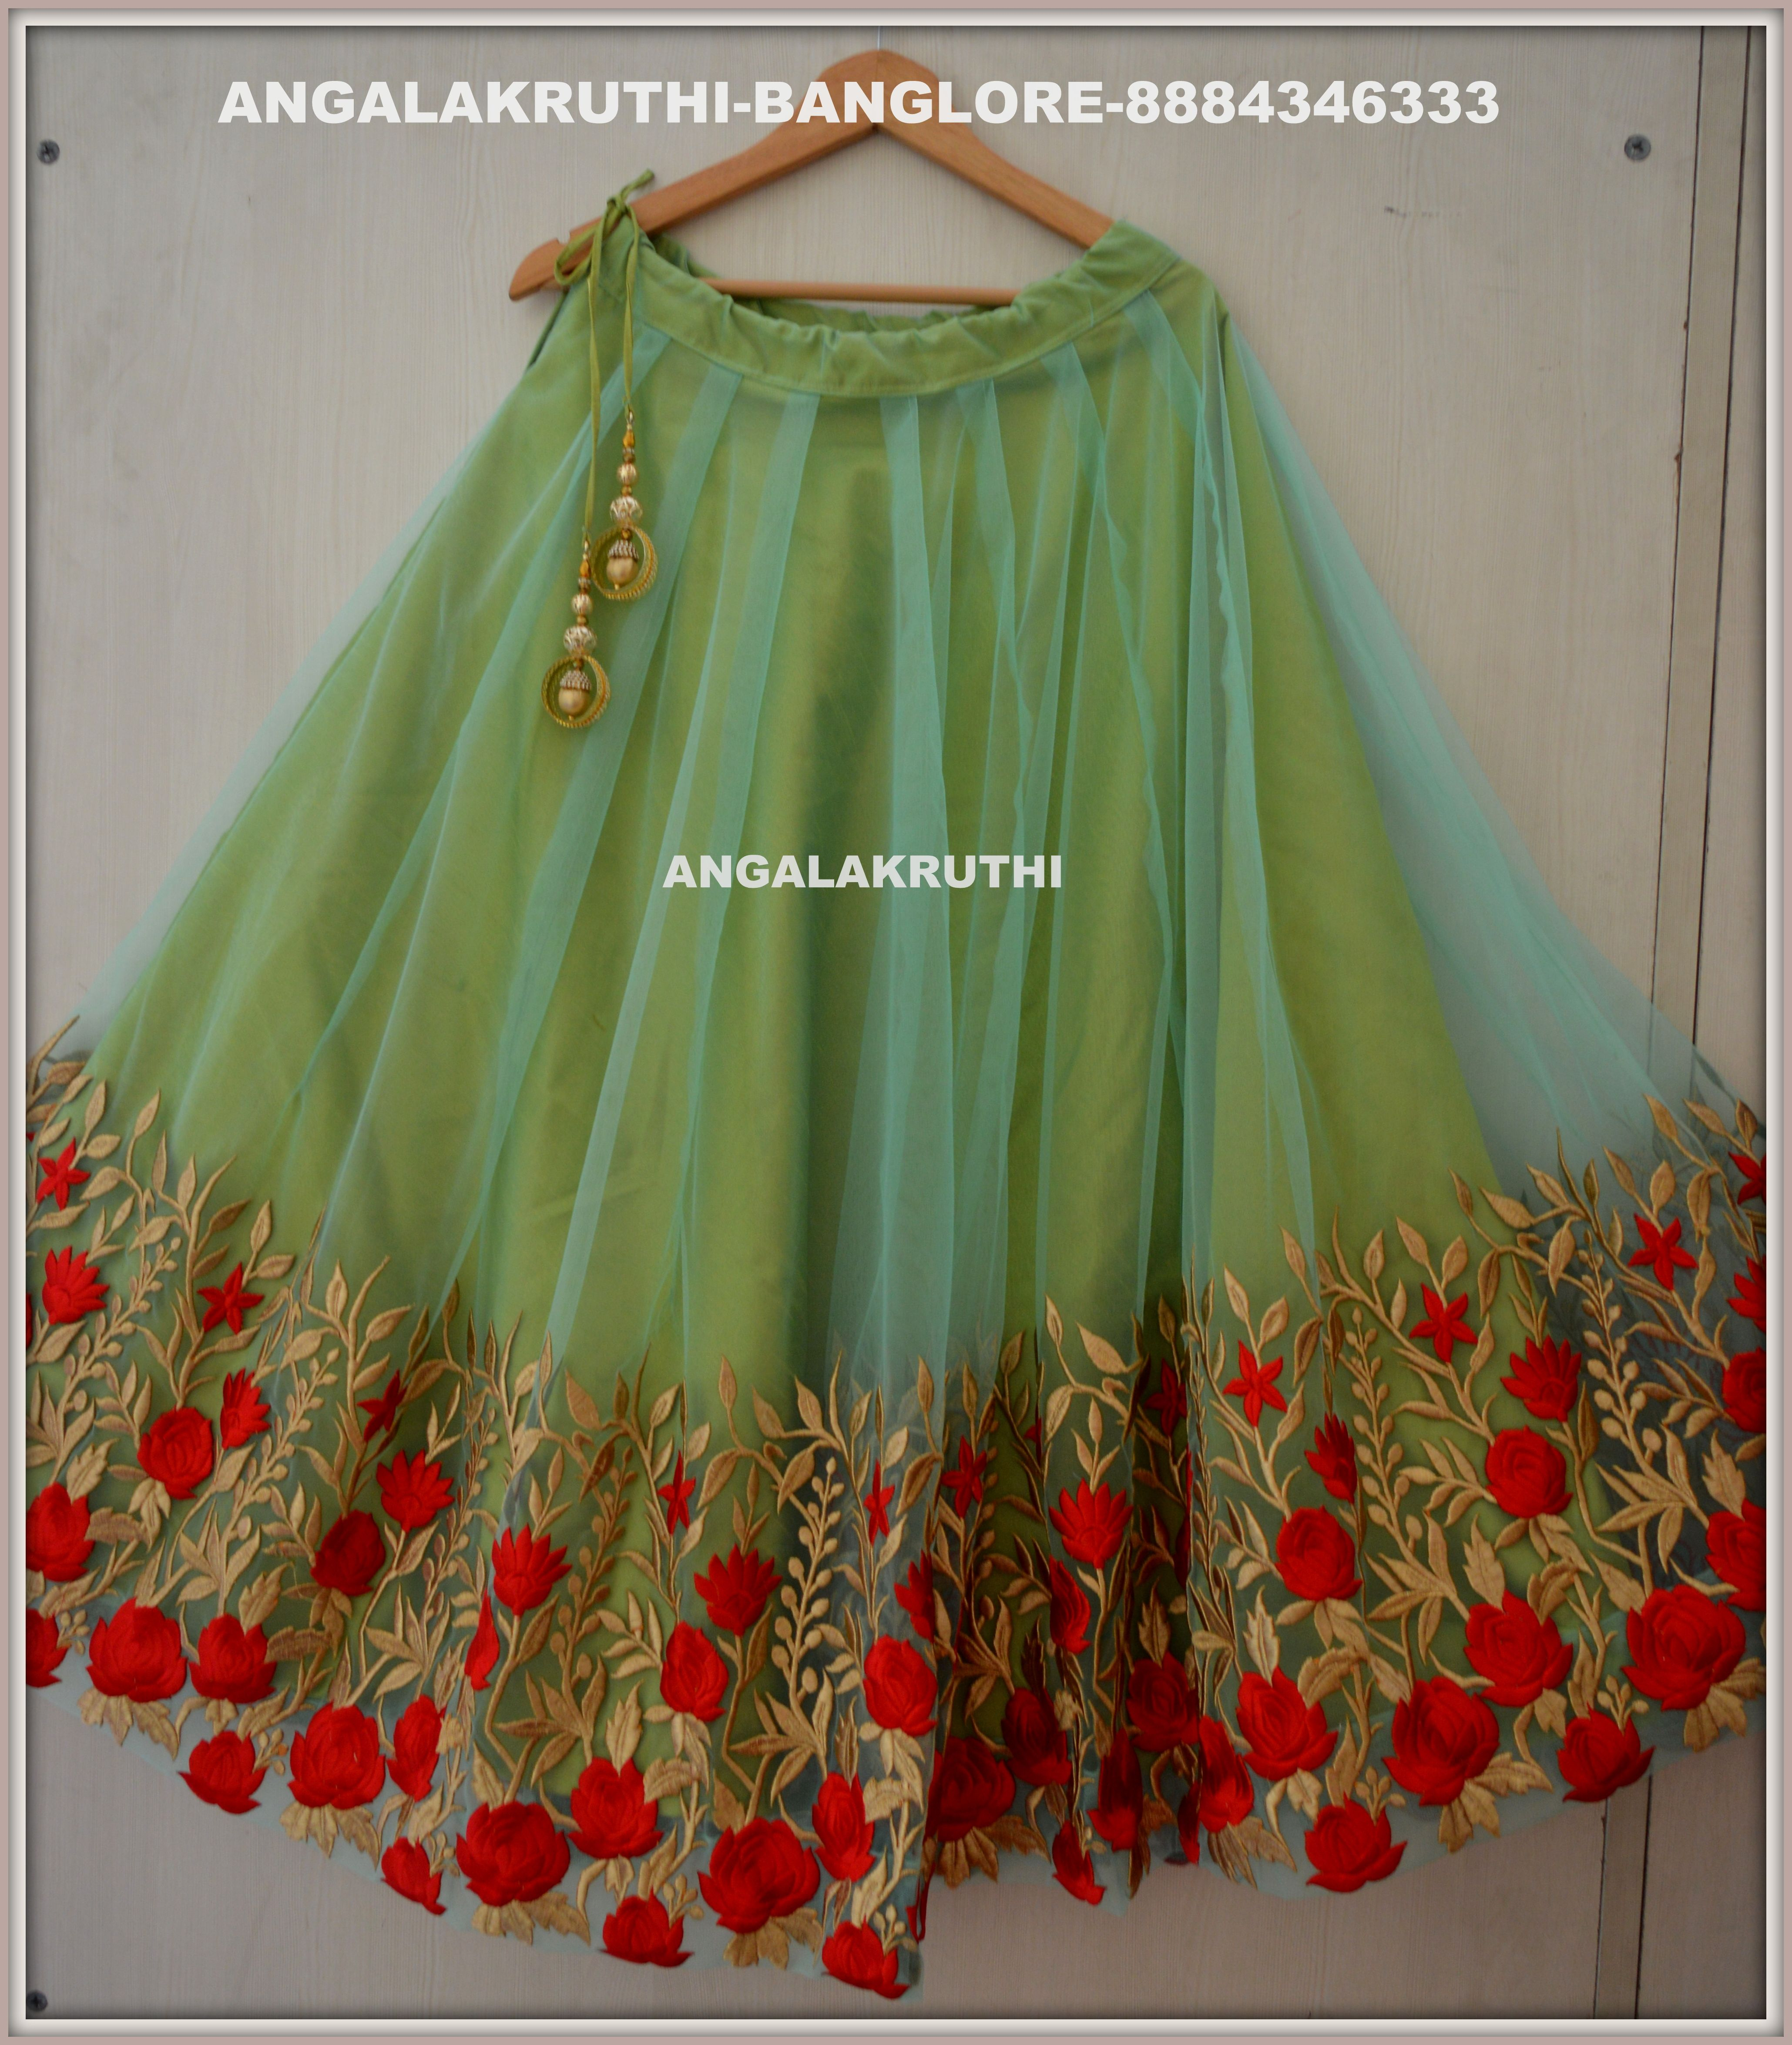 aa27cb1269b Lehenga design by Angalakruthi watsapp:+91-8884347333 custom designs by  Angalakruthi-Ladies and kids boutique in Bangalore angalakruthi- custom  designer ...